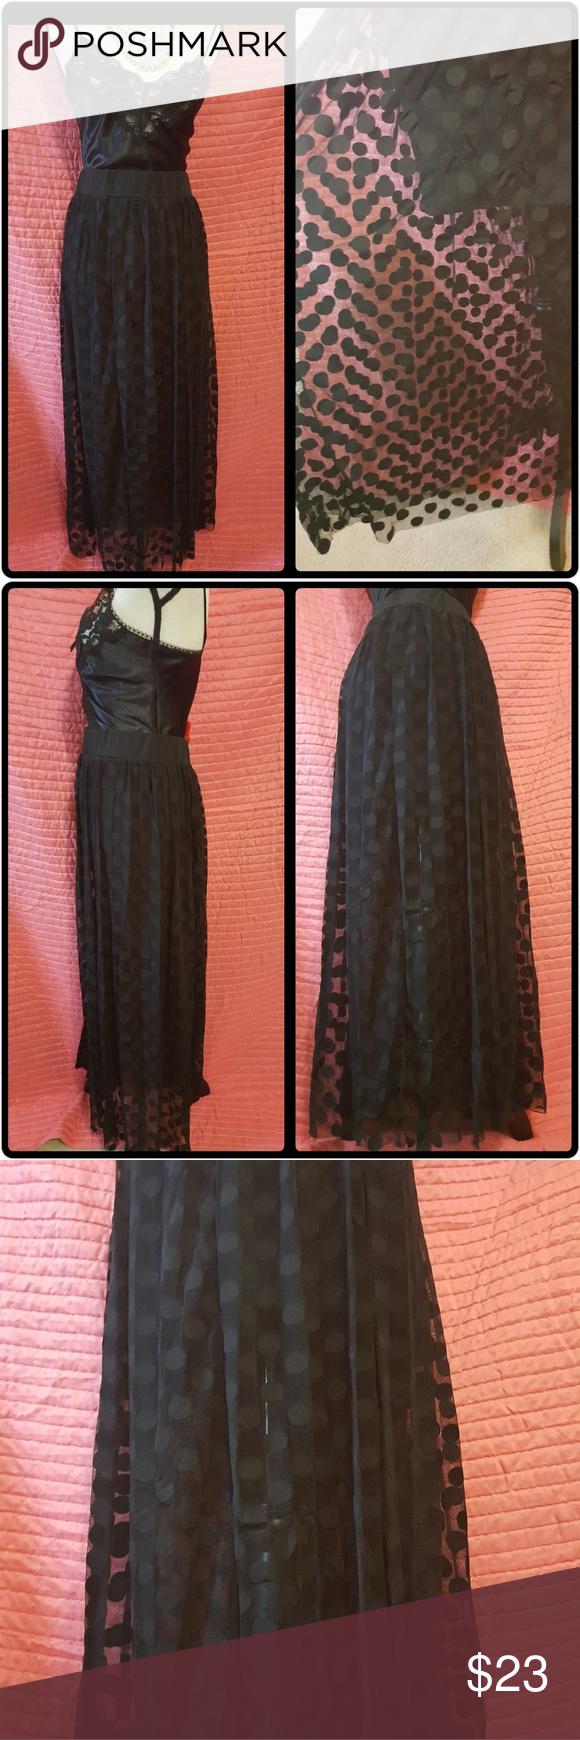 Black maxi skirt boutique black maxi short skirts and shorts